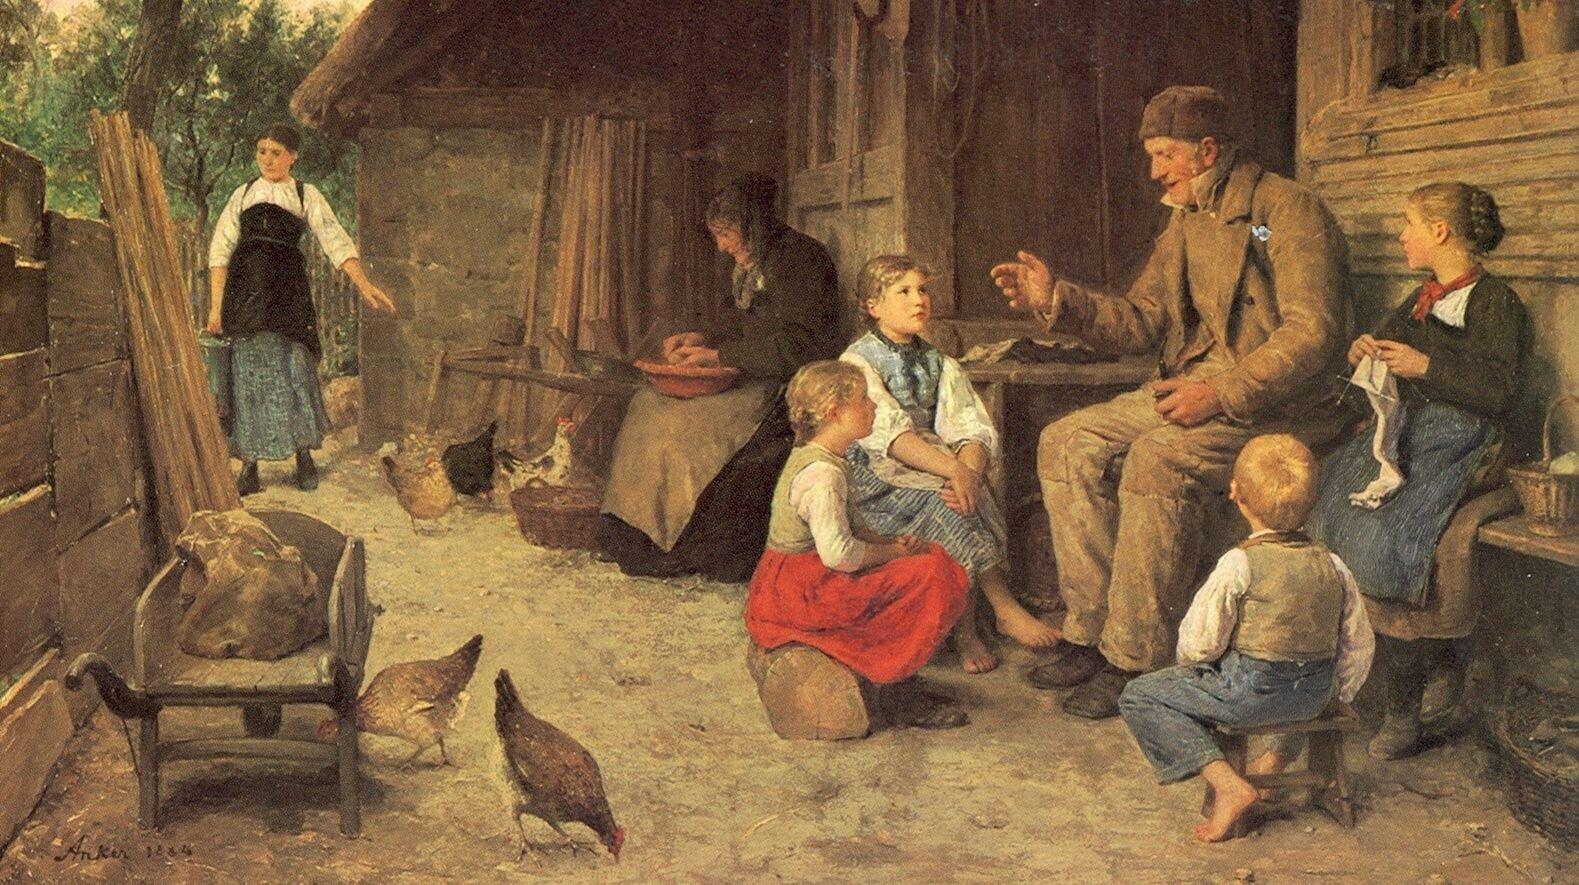 Dziadek opowiada bajkę Źródło: Albert Anker, Dziadek opowiada bajkę, 1884, domena publiczna.